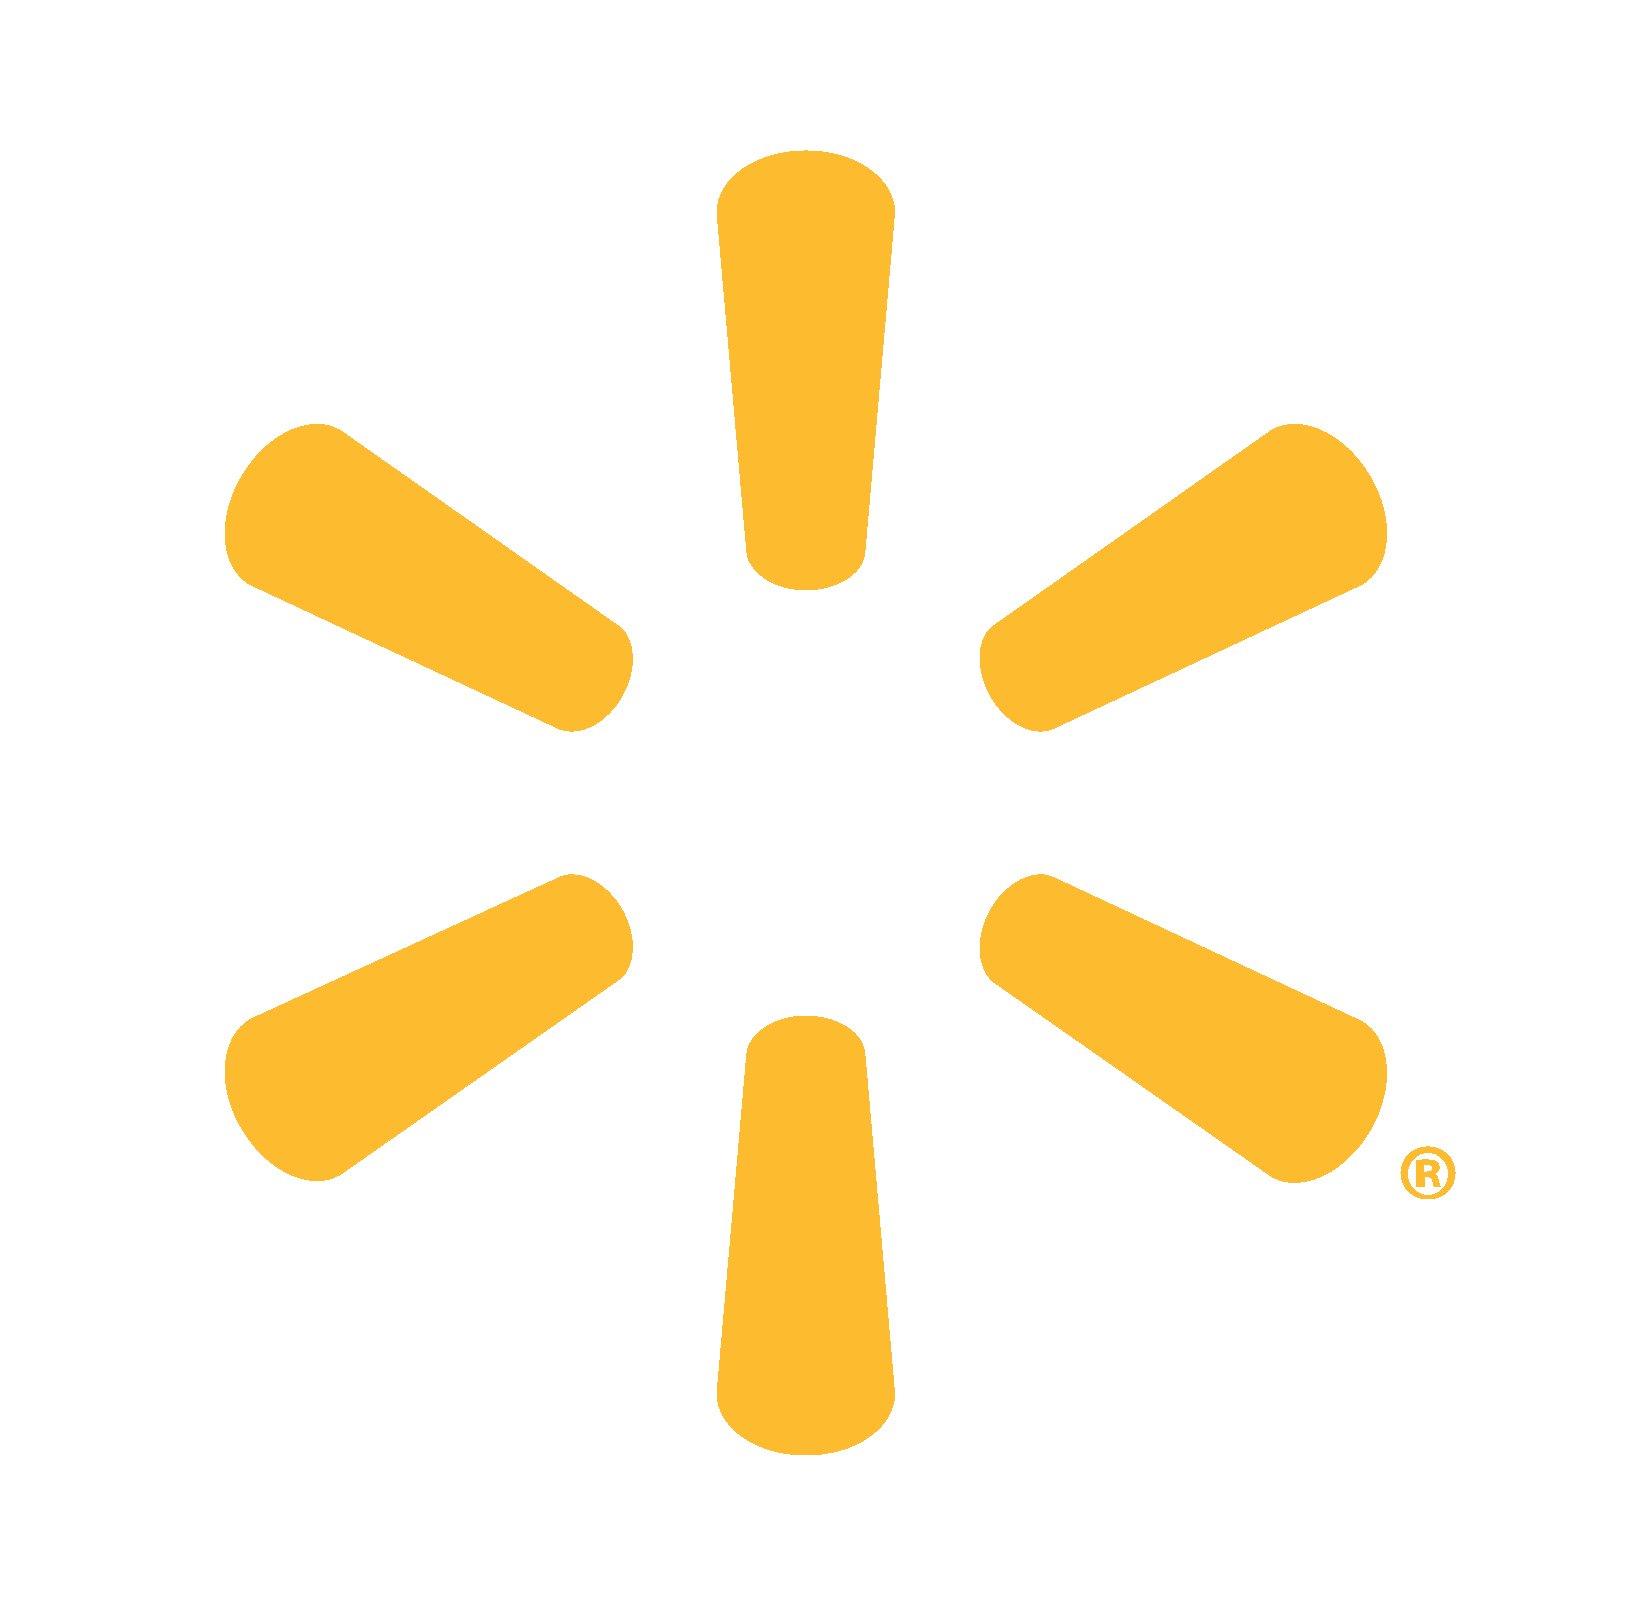 walmart logo walmart symbol meaning history and evolution